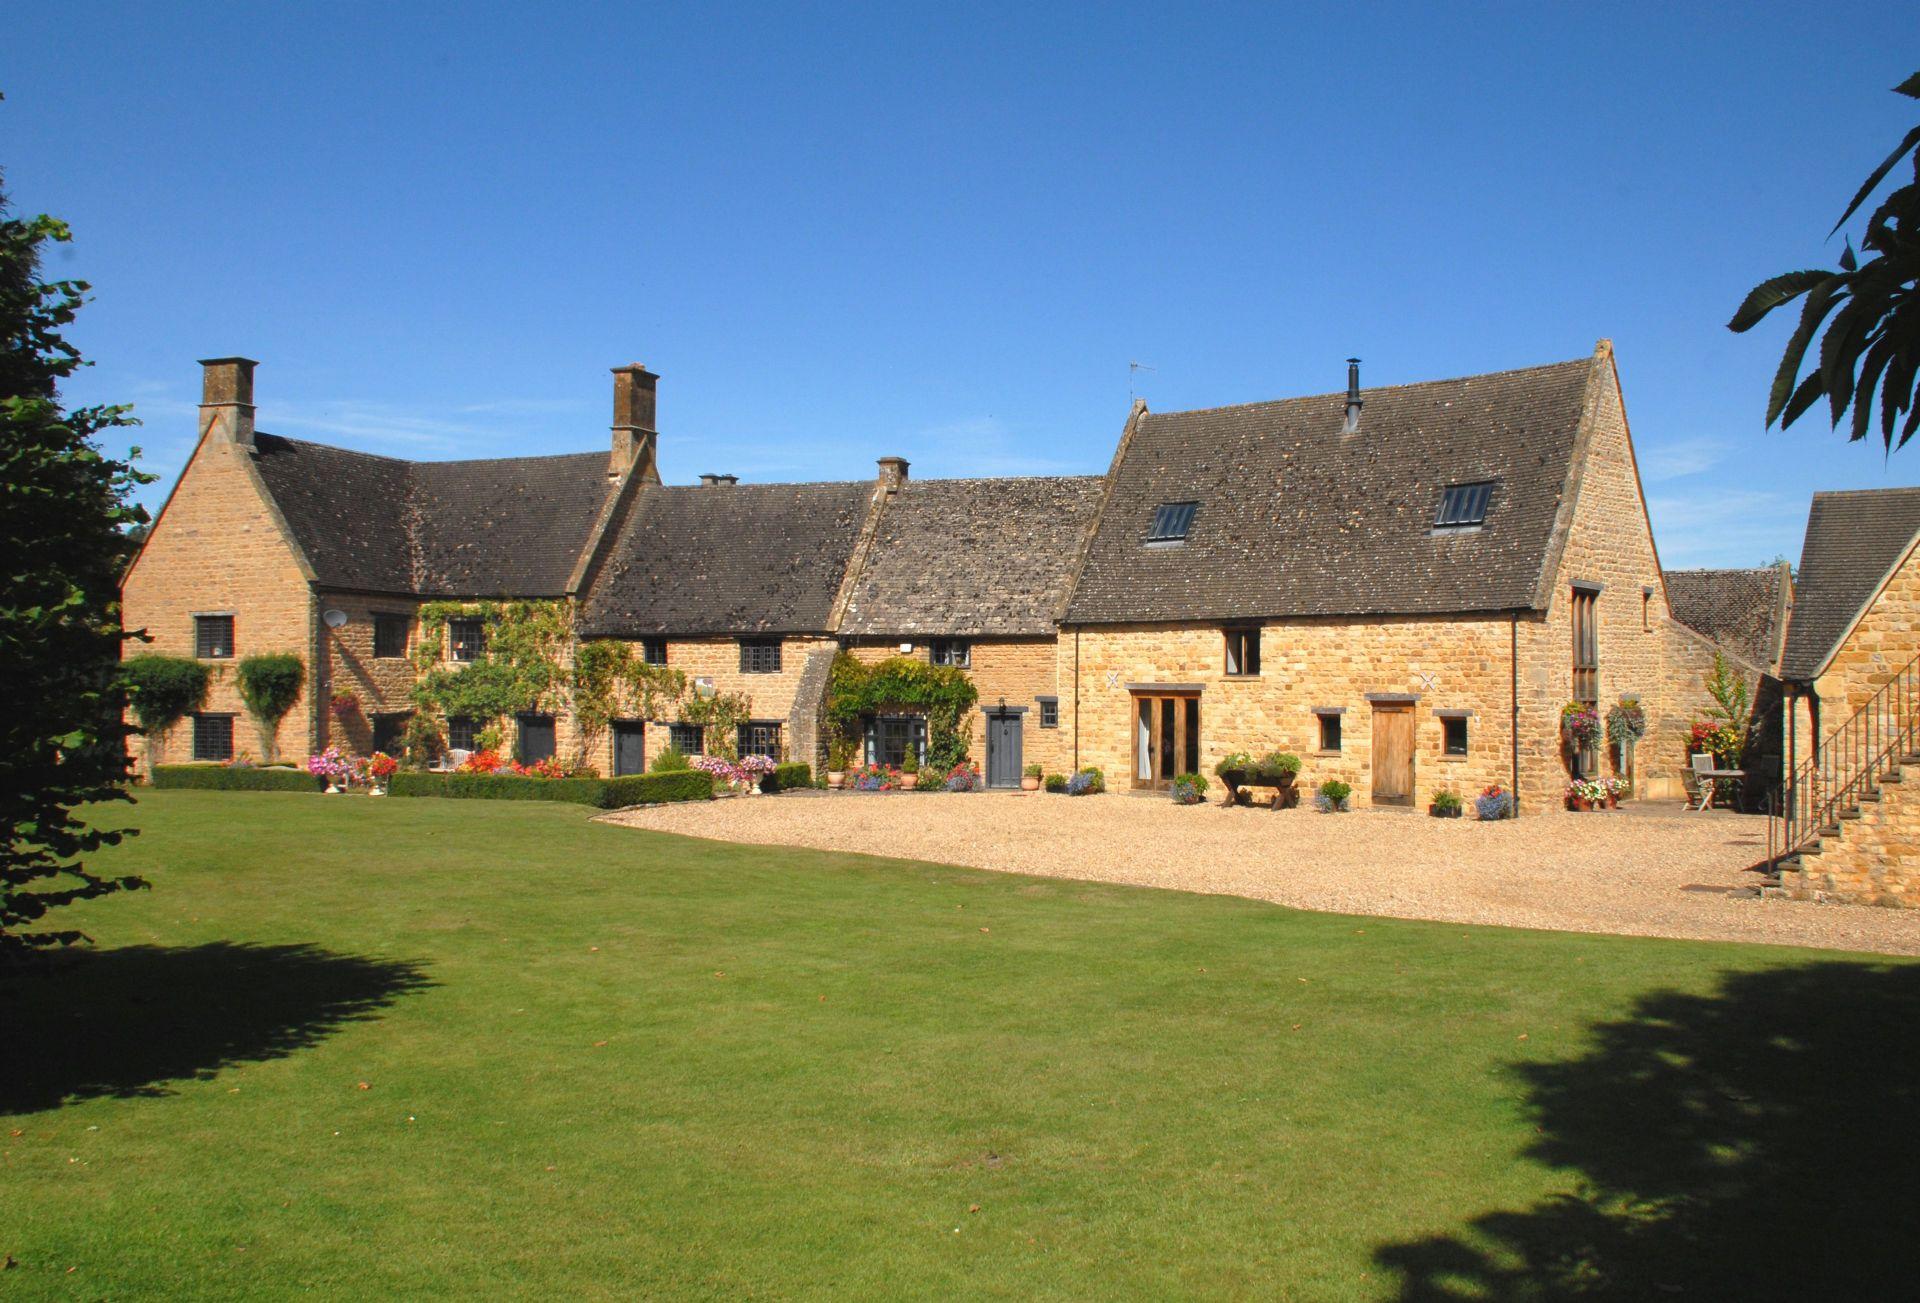 Image of Stourton Manor